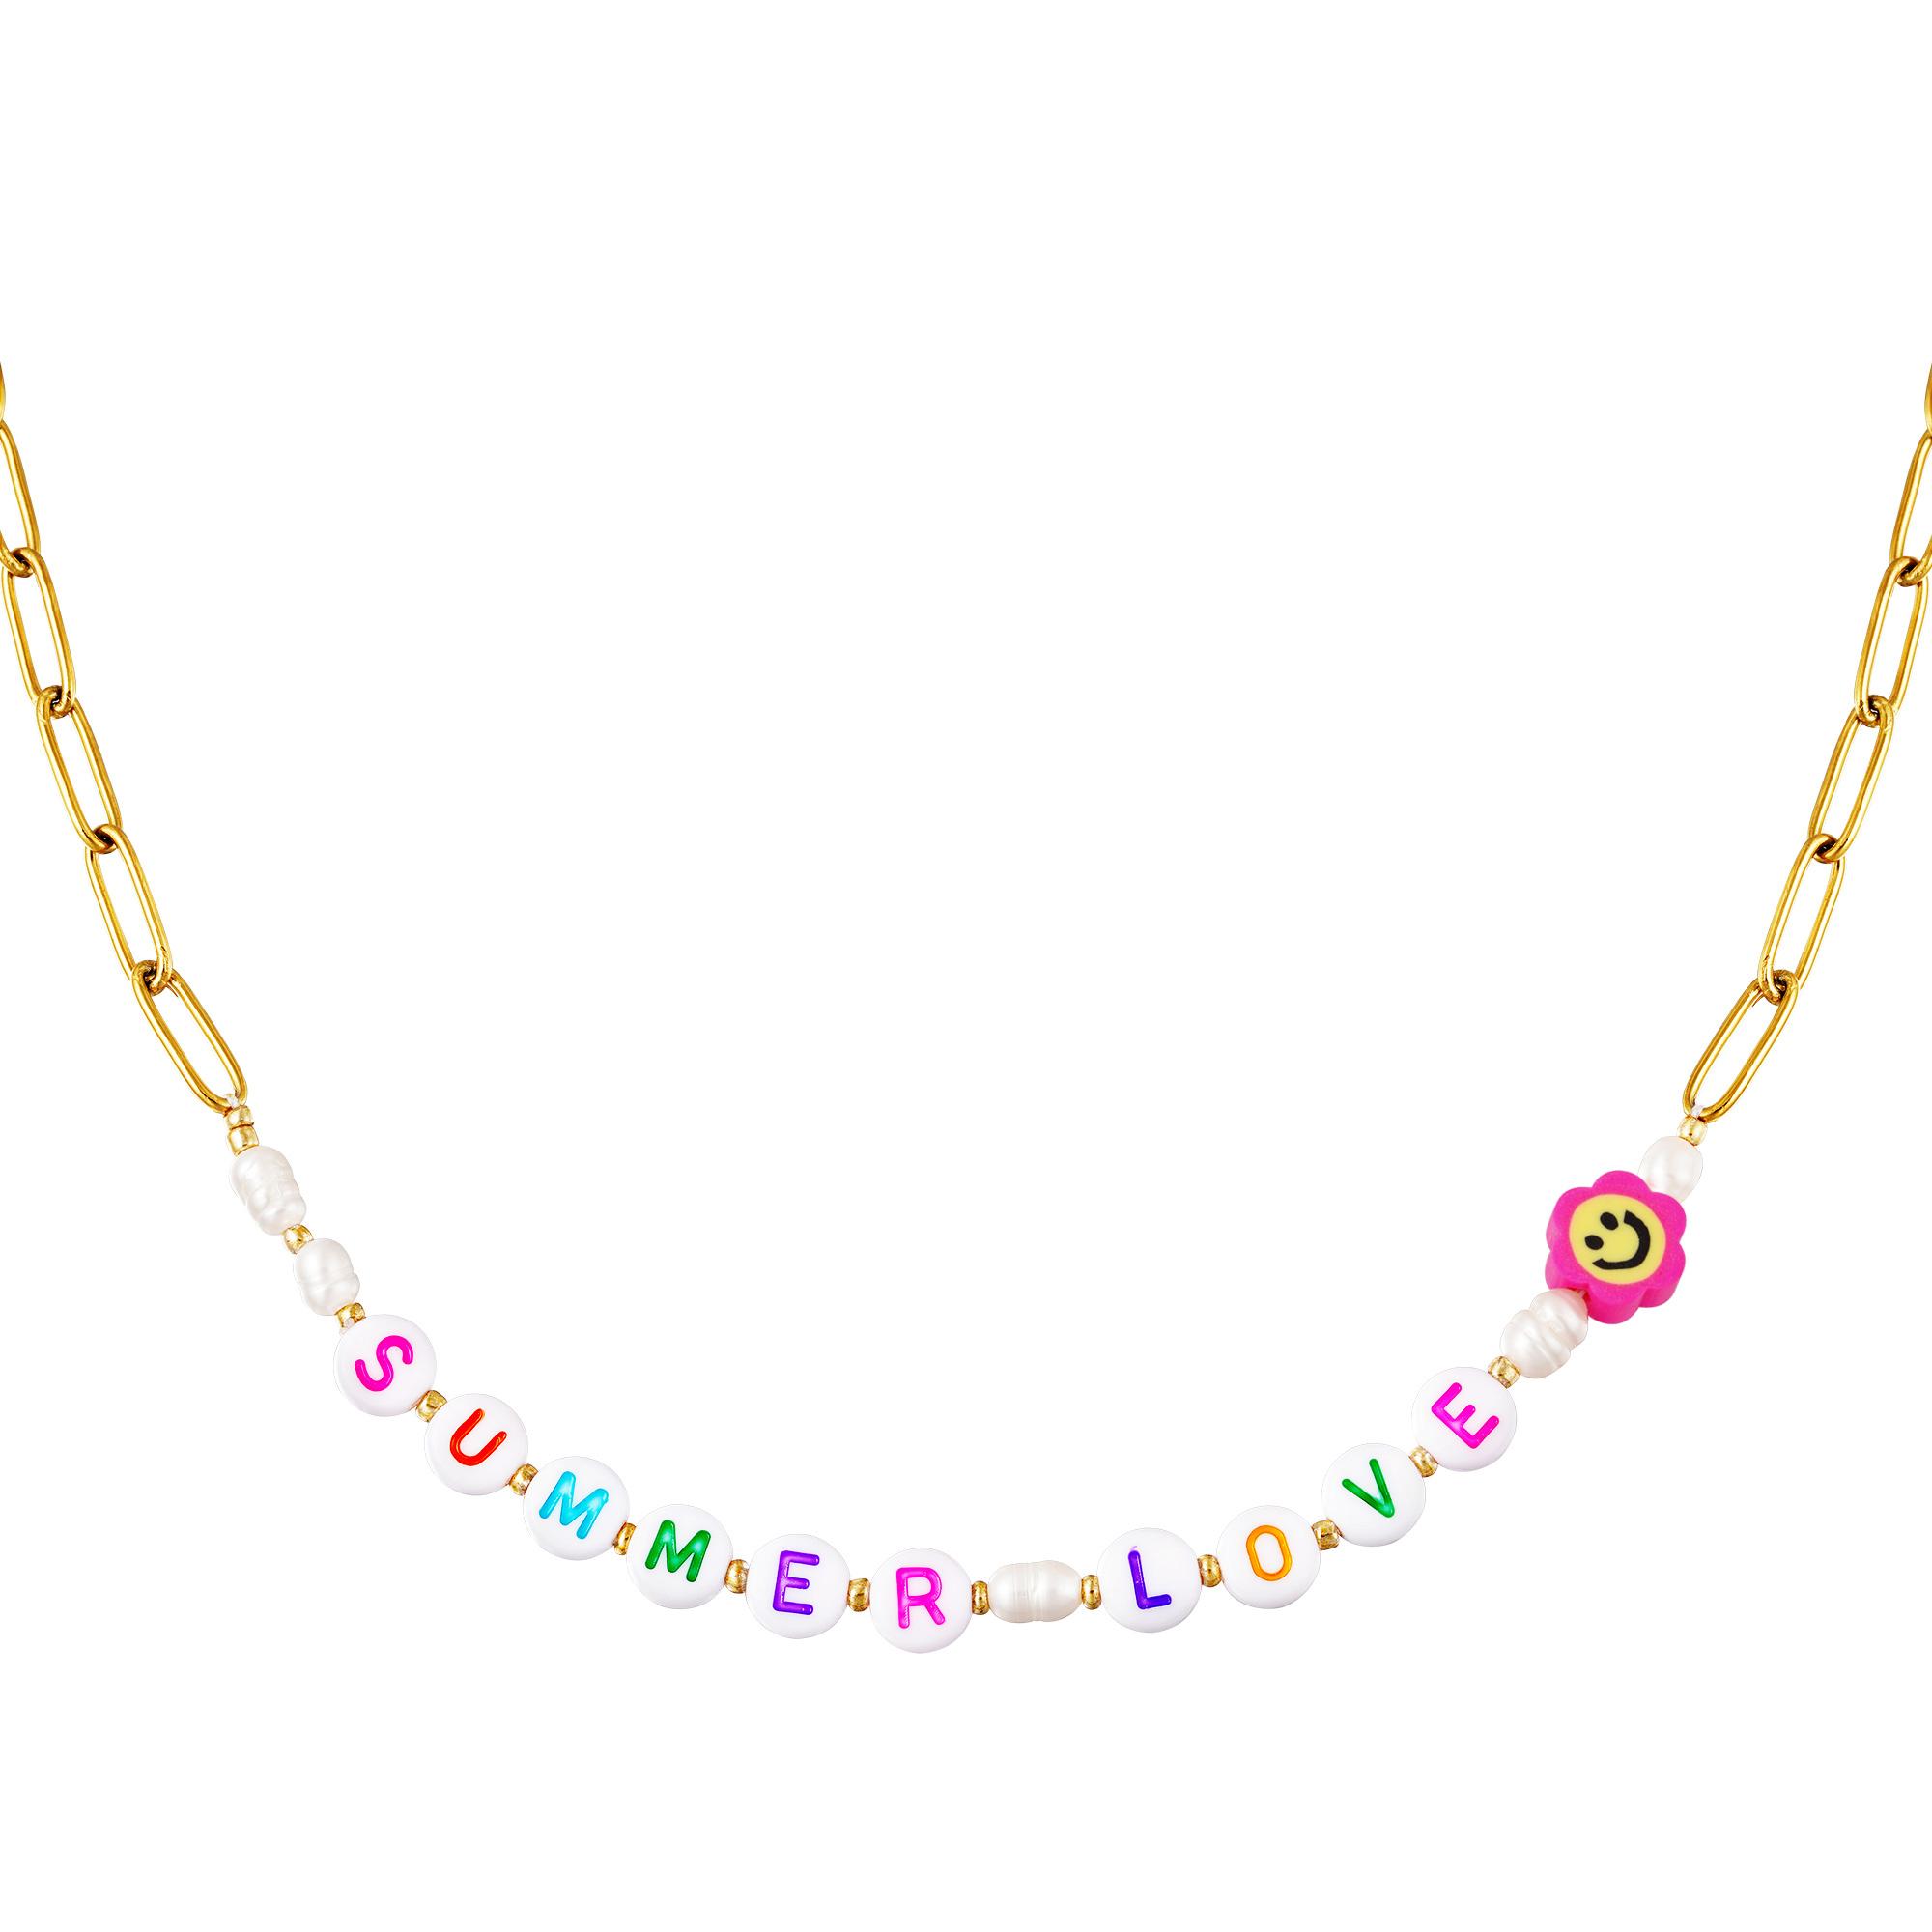 RVS SchakkelKetting Summer Love gouden dames kettingen plastic letter blokjes bedel sieraden necklages kopen bestellen festival yehwang